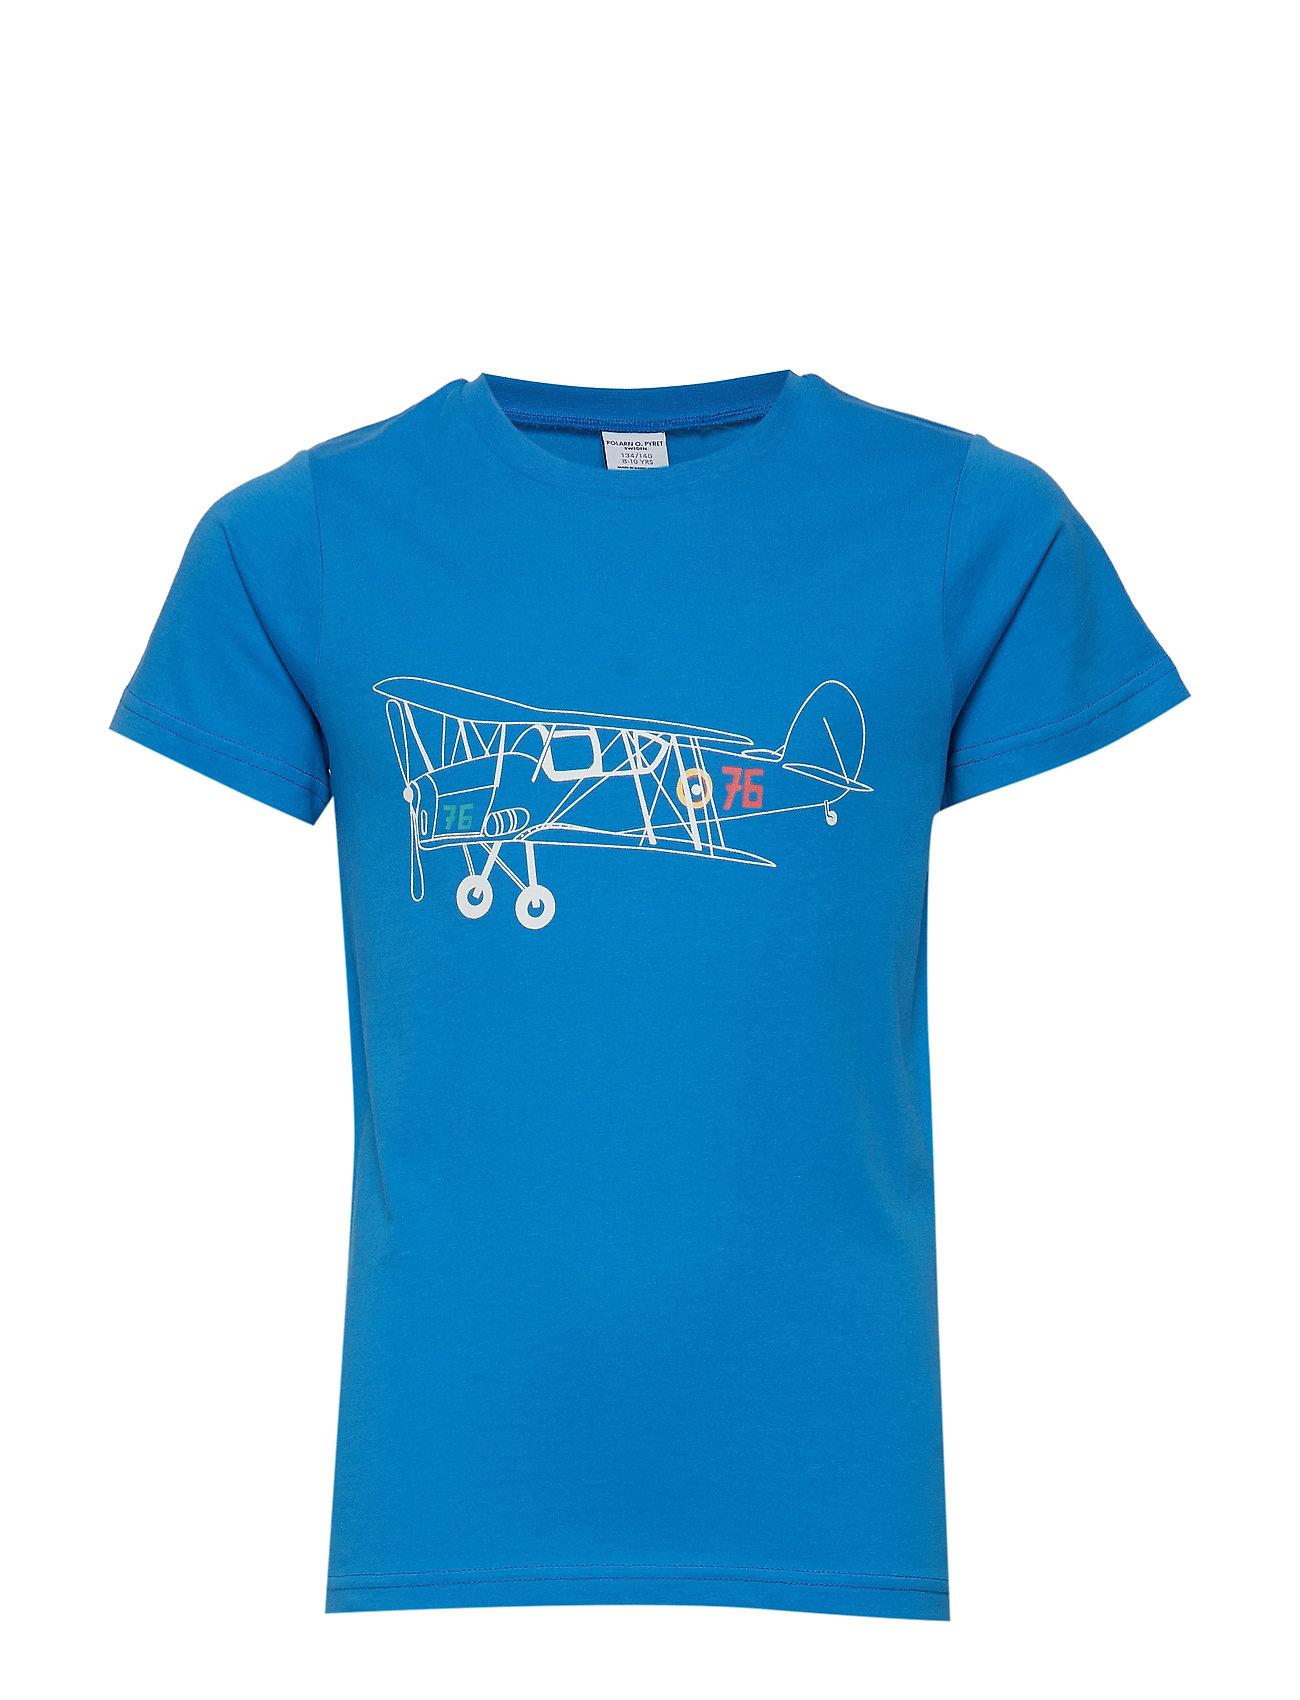 Polarn O. Pyret T-shirt s/s Frontprint School